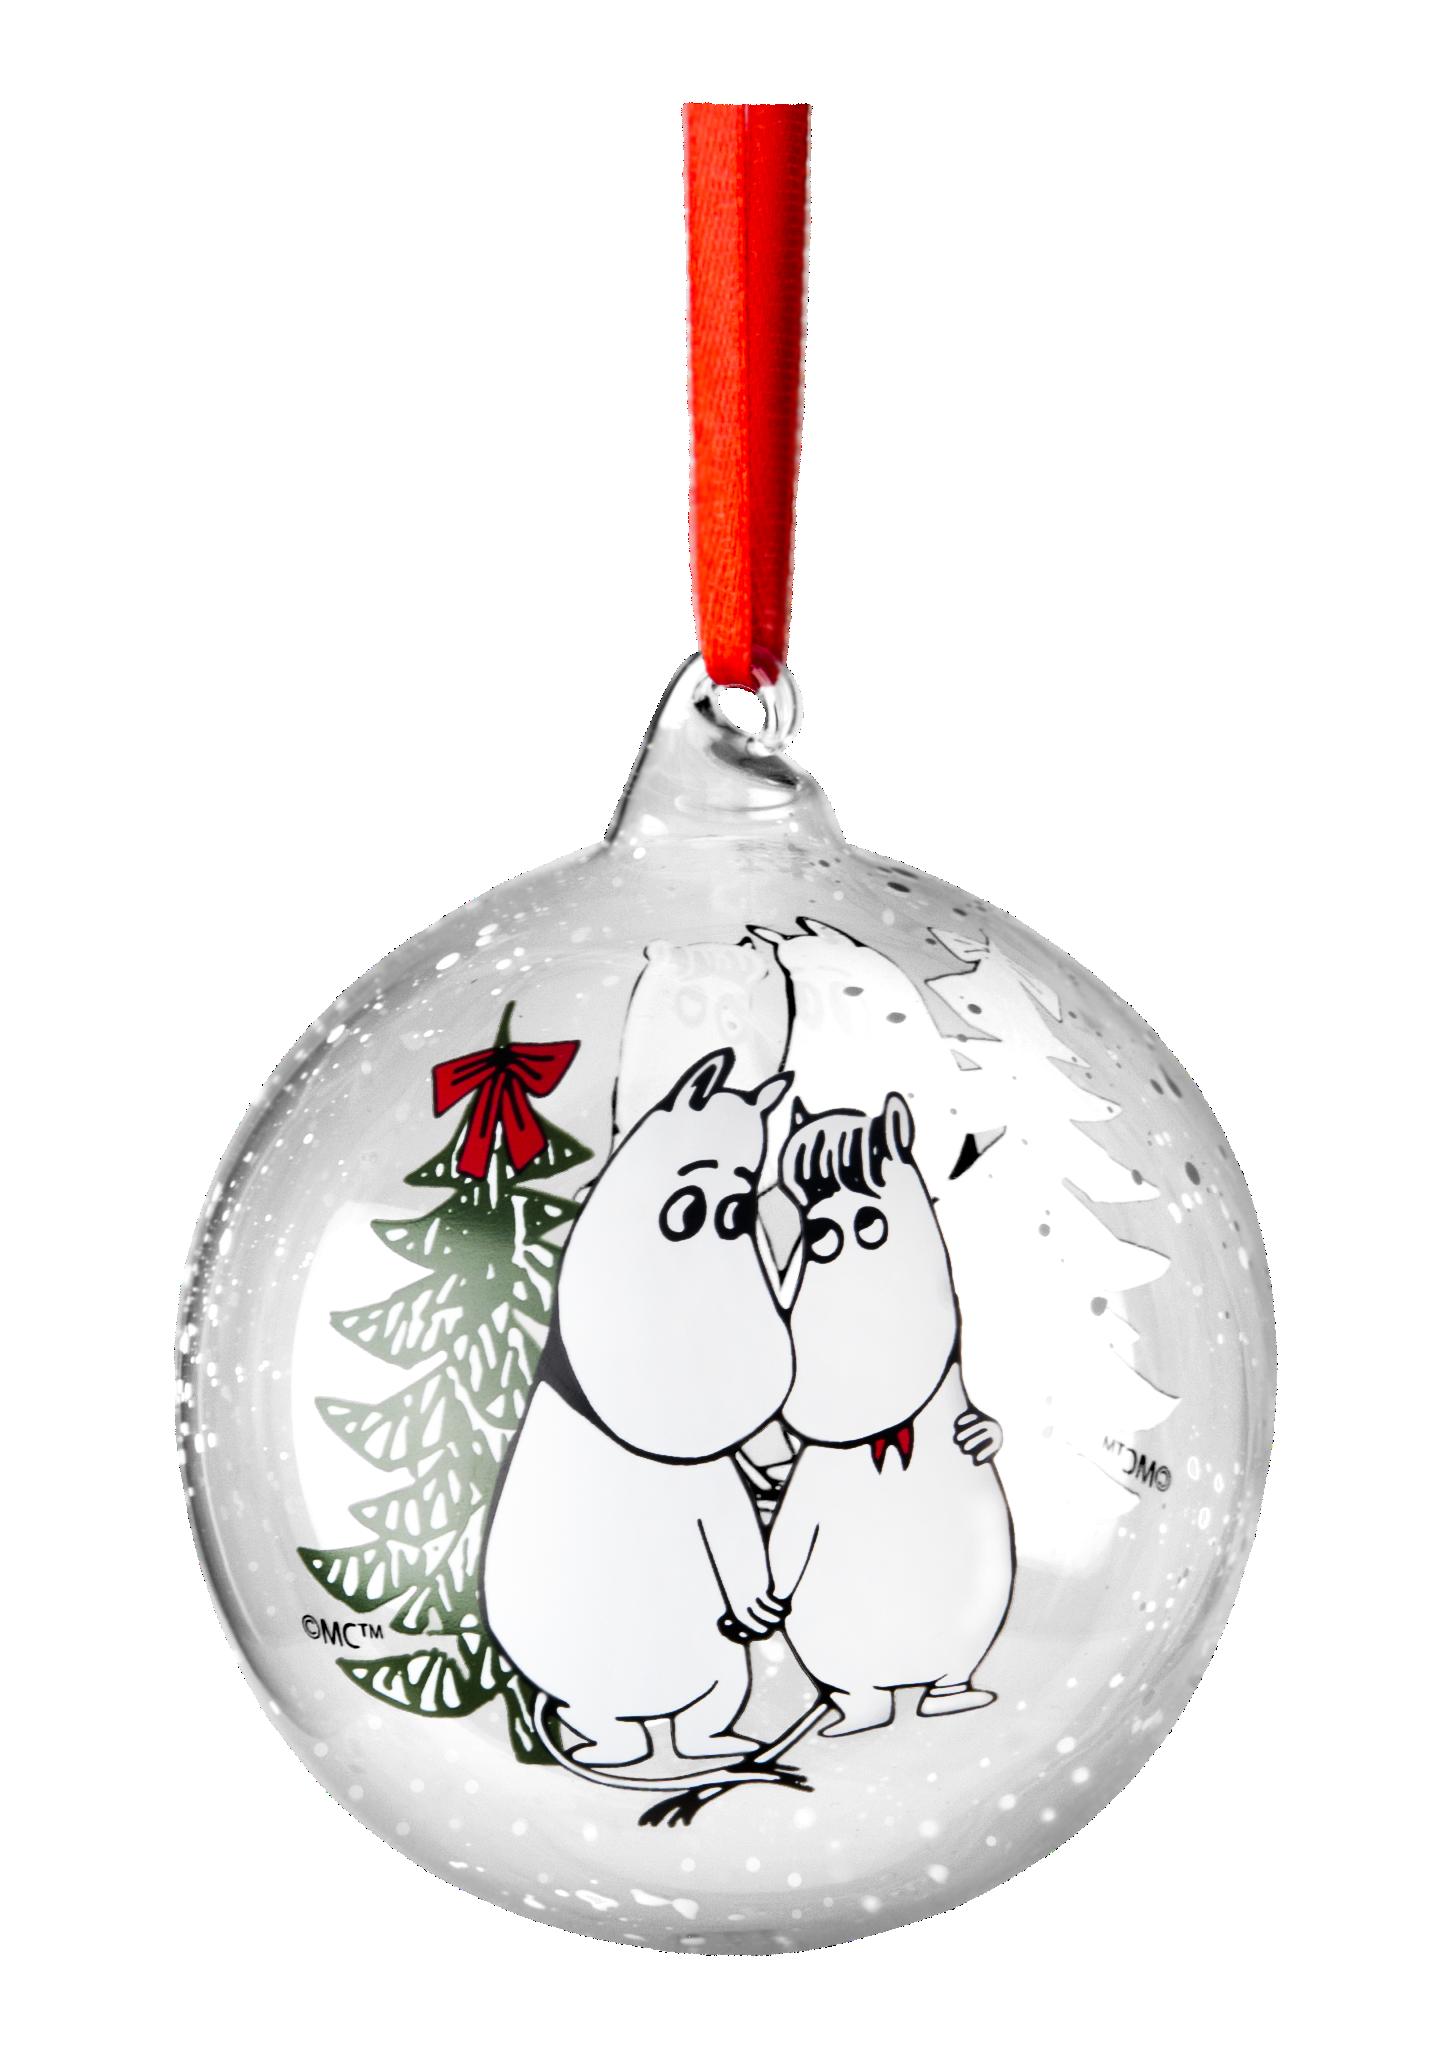 Muurla Moomin Winter Magic decoration ball 9cm